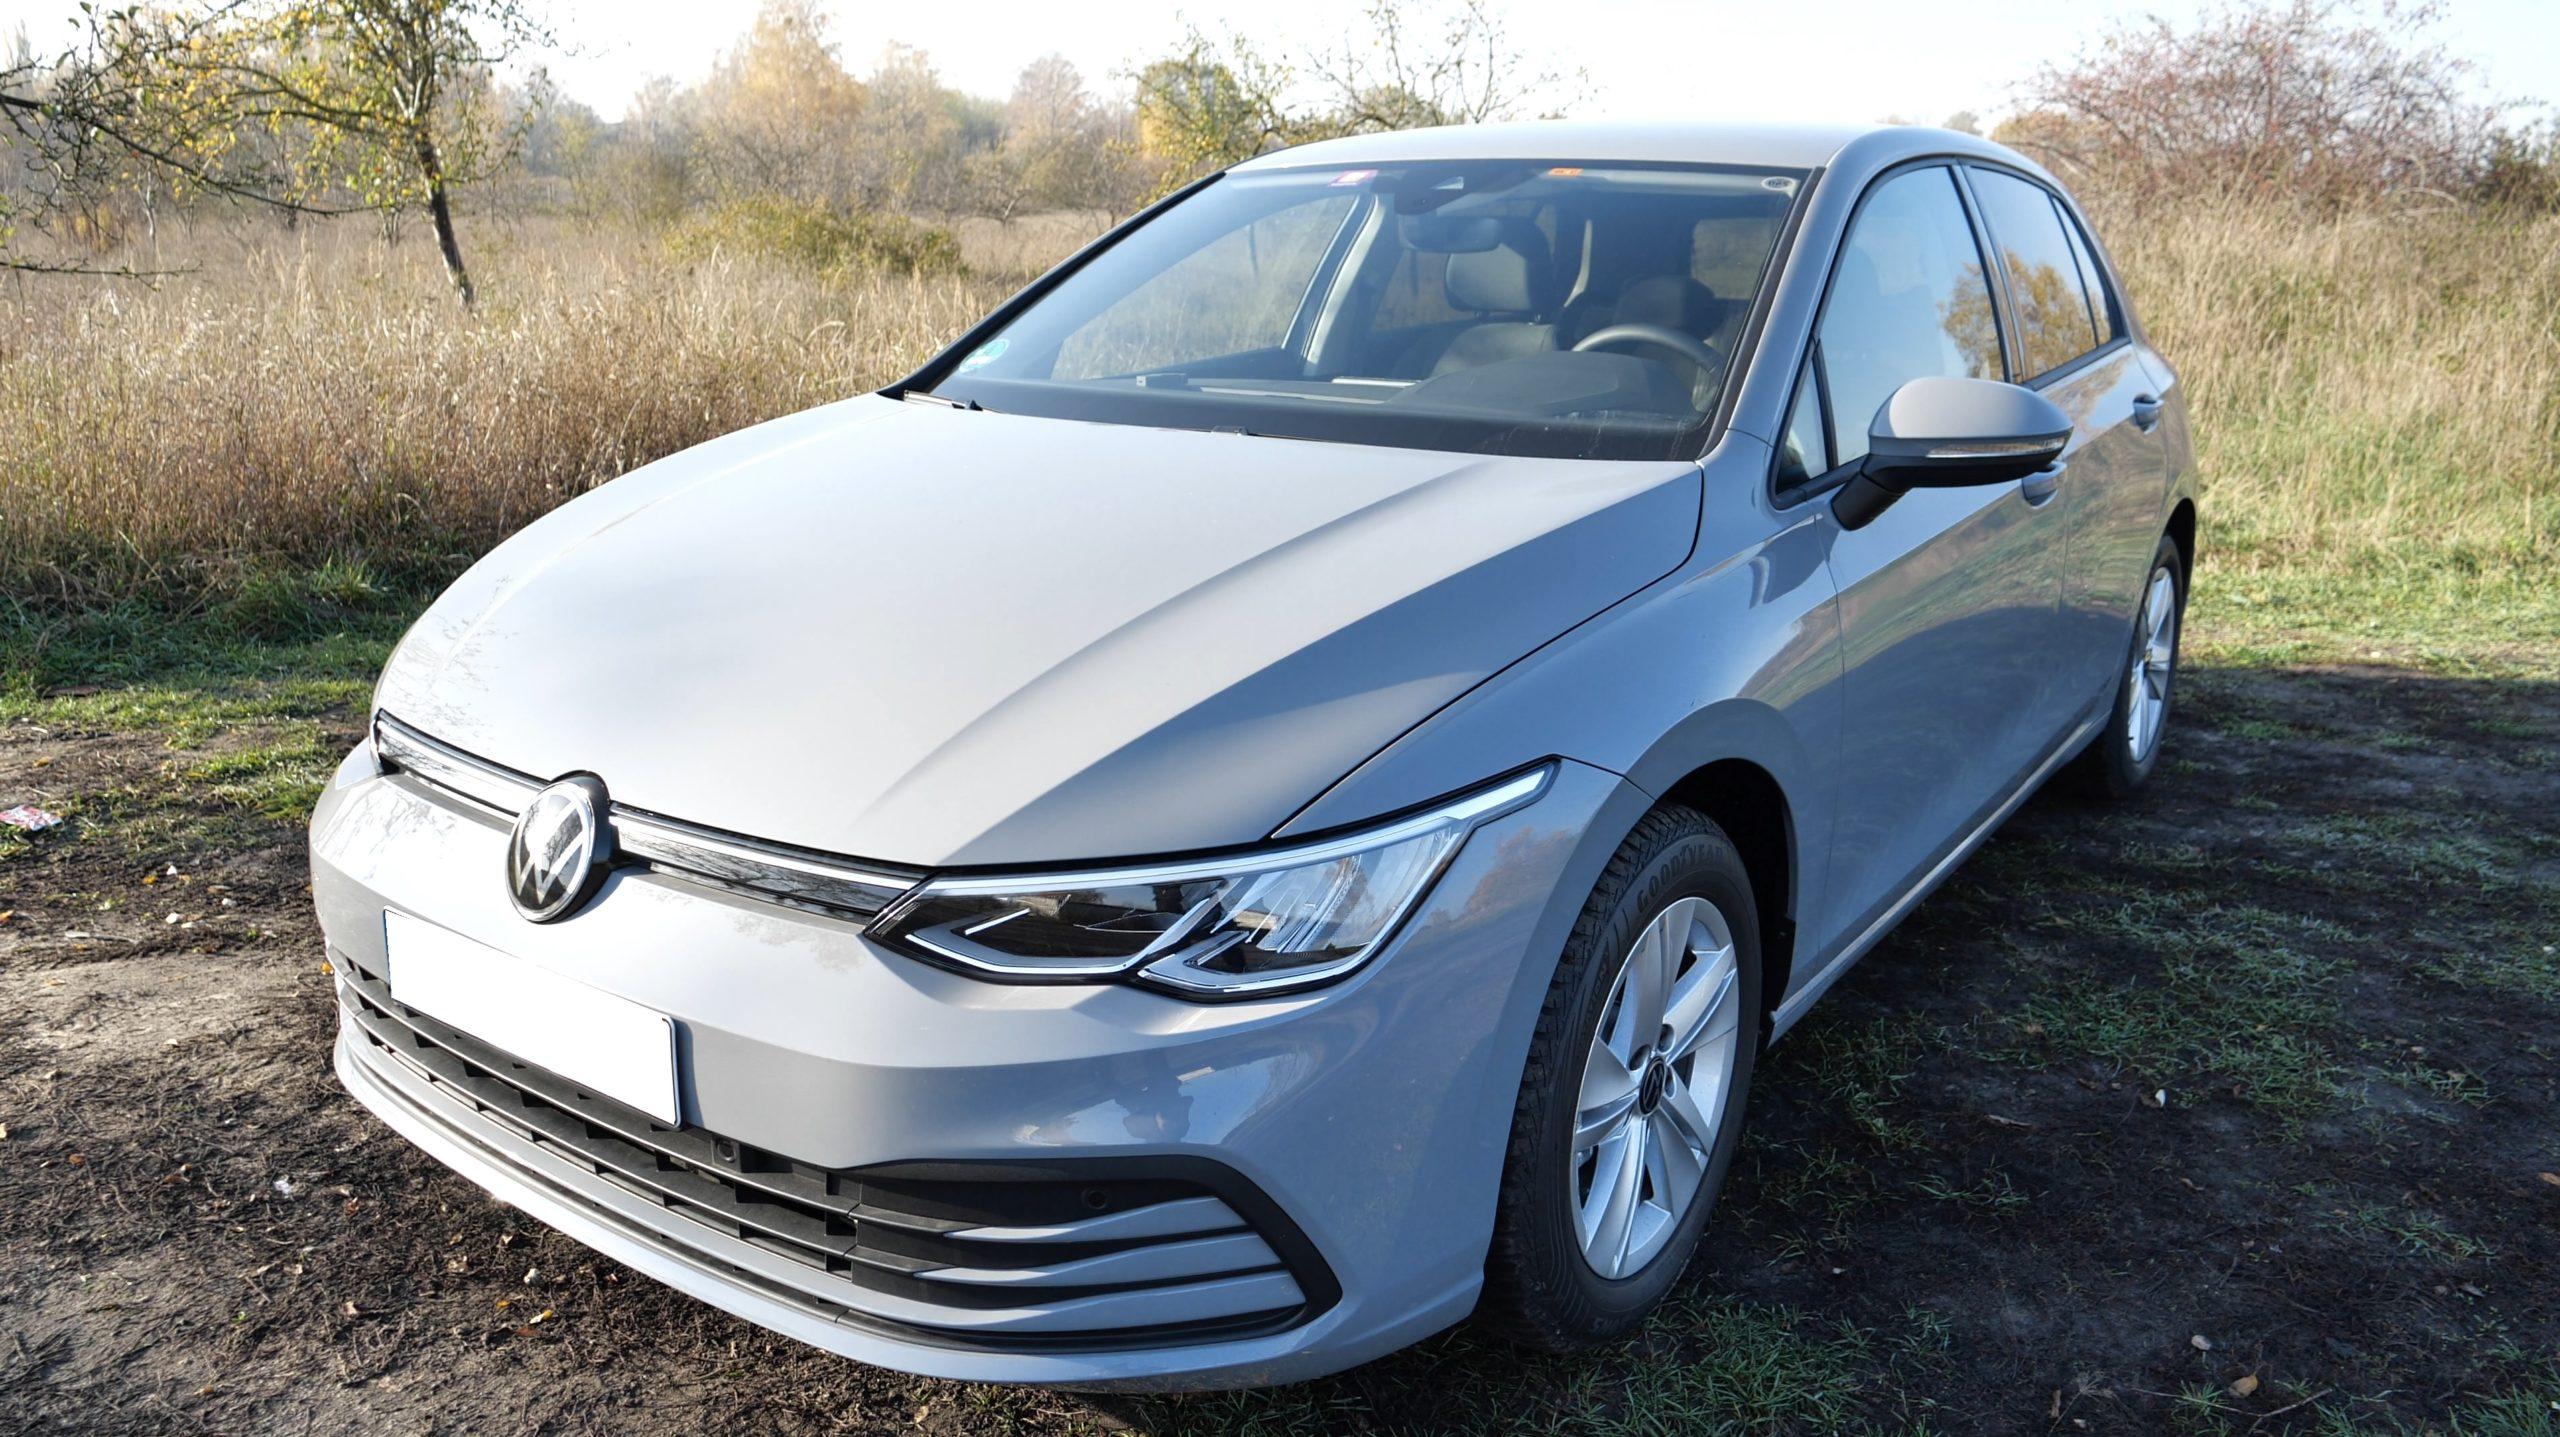 2020 Volkswagen Golf VIII 2.0 Tdi DSG